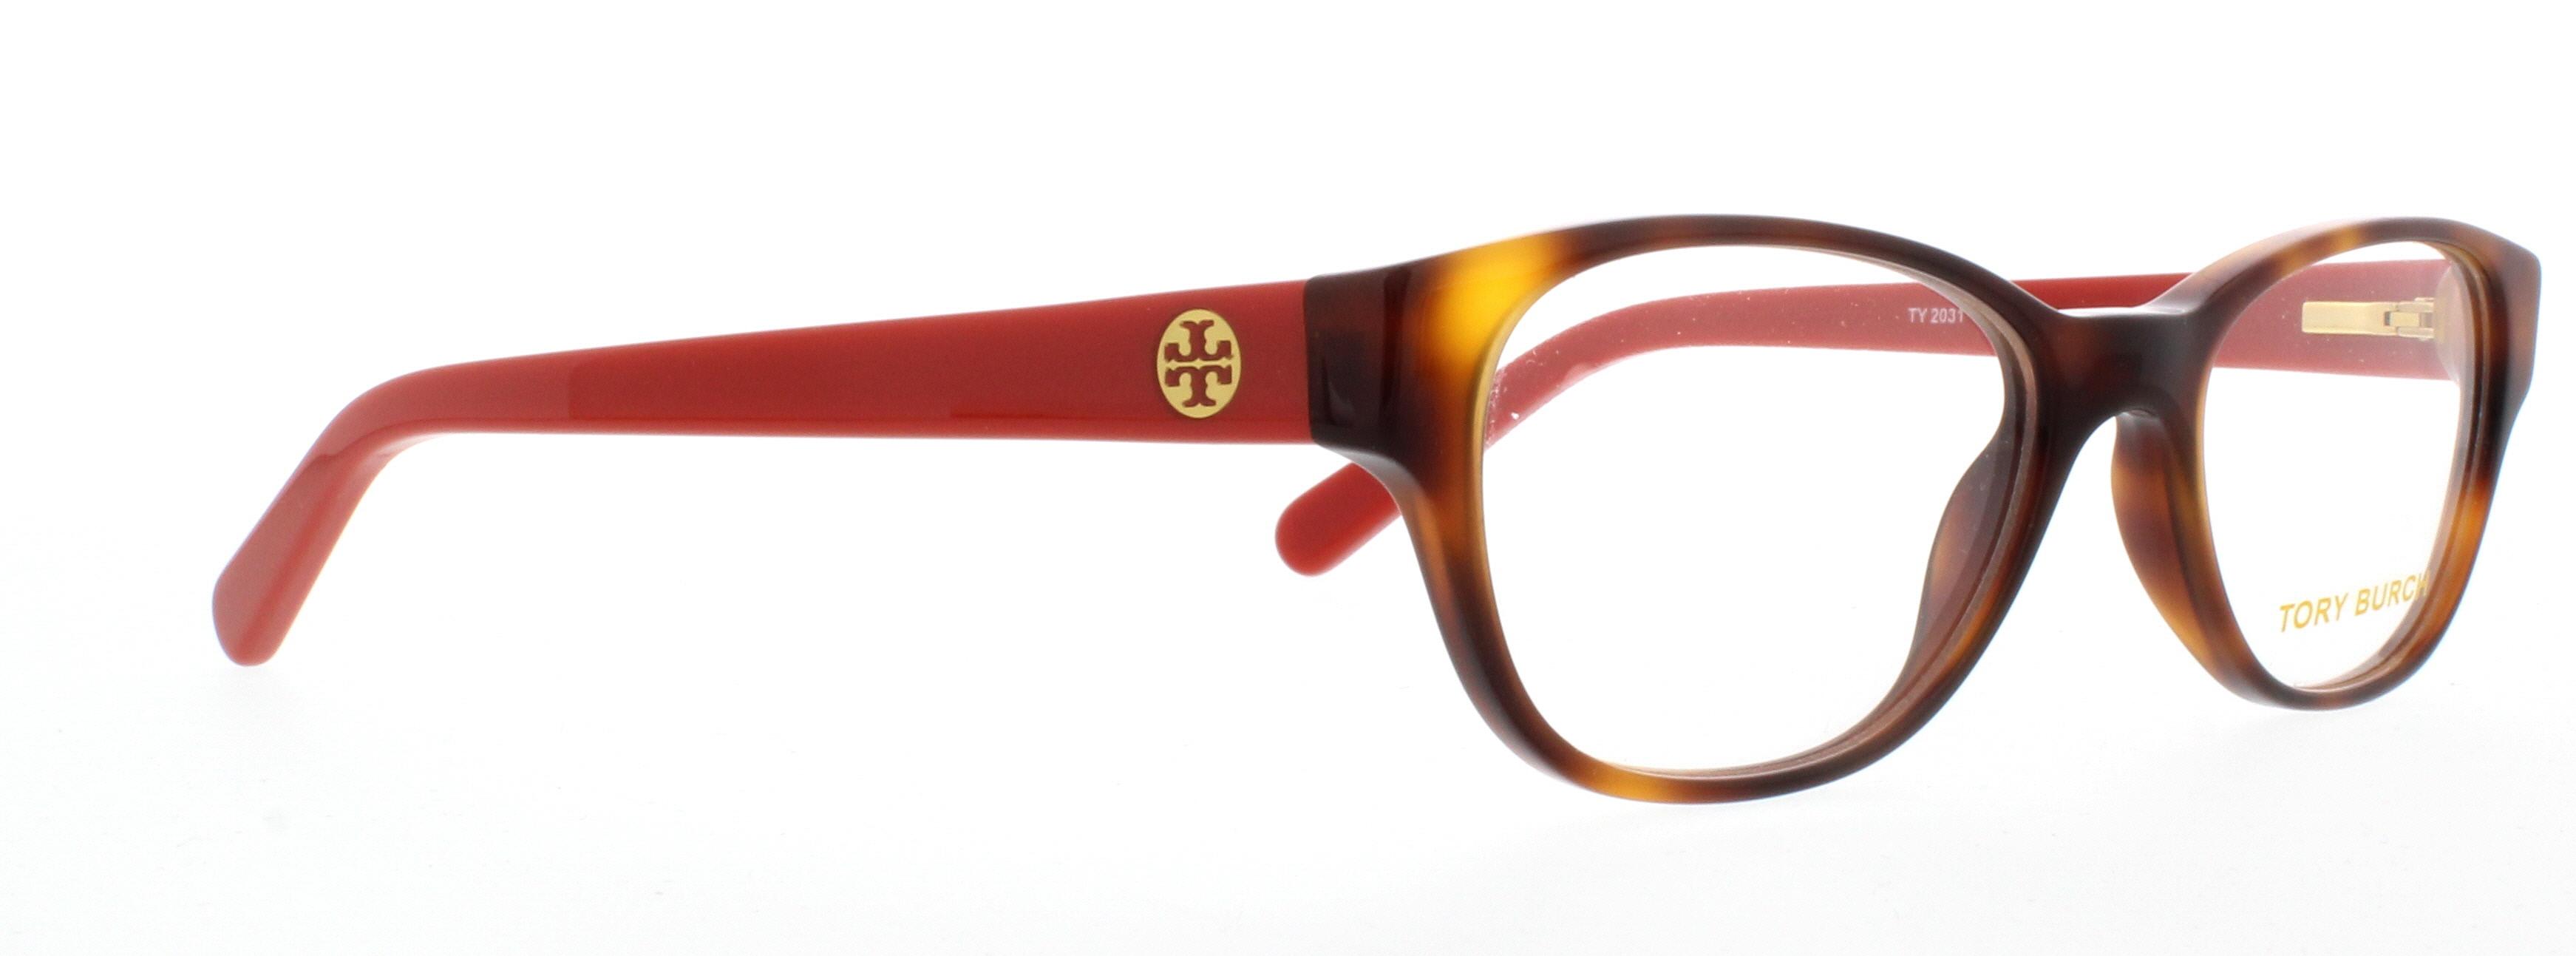 TORY BURCH Eyeglasses TY 2031 1162 Amber Orange 49MM qGvO5DMC